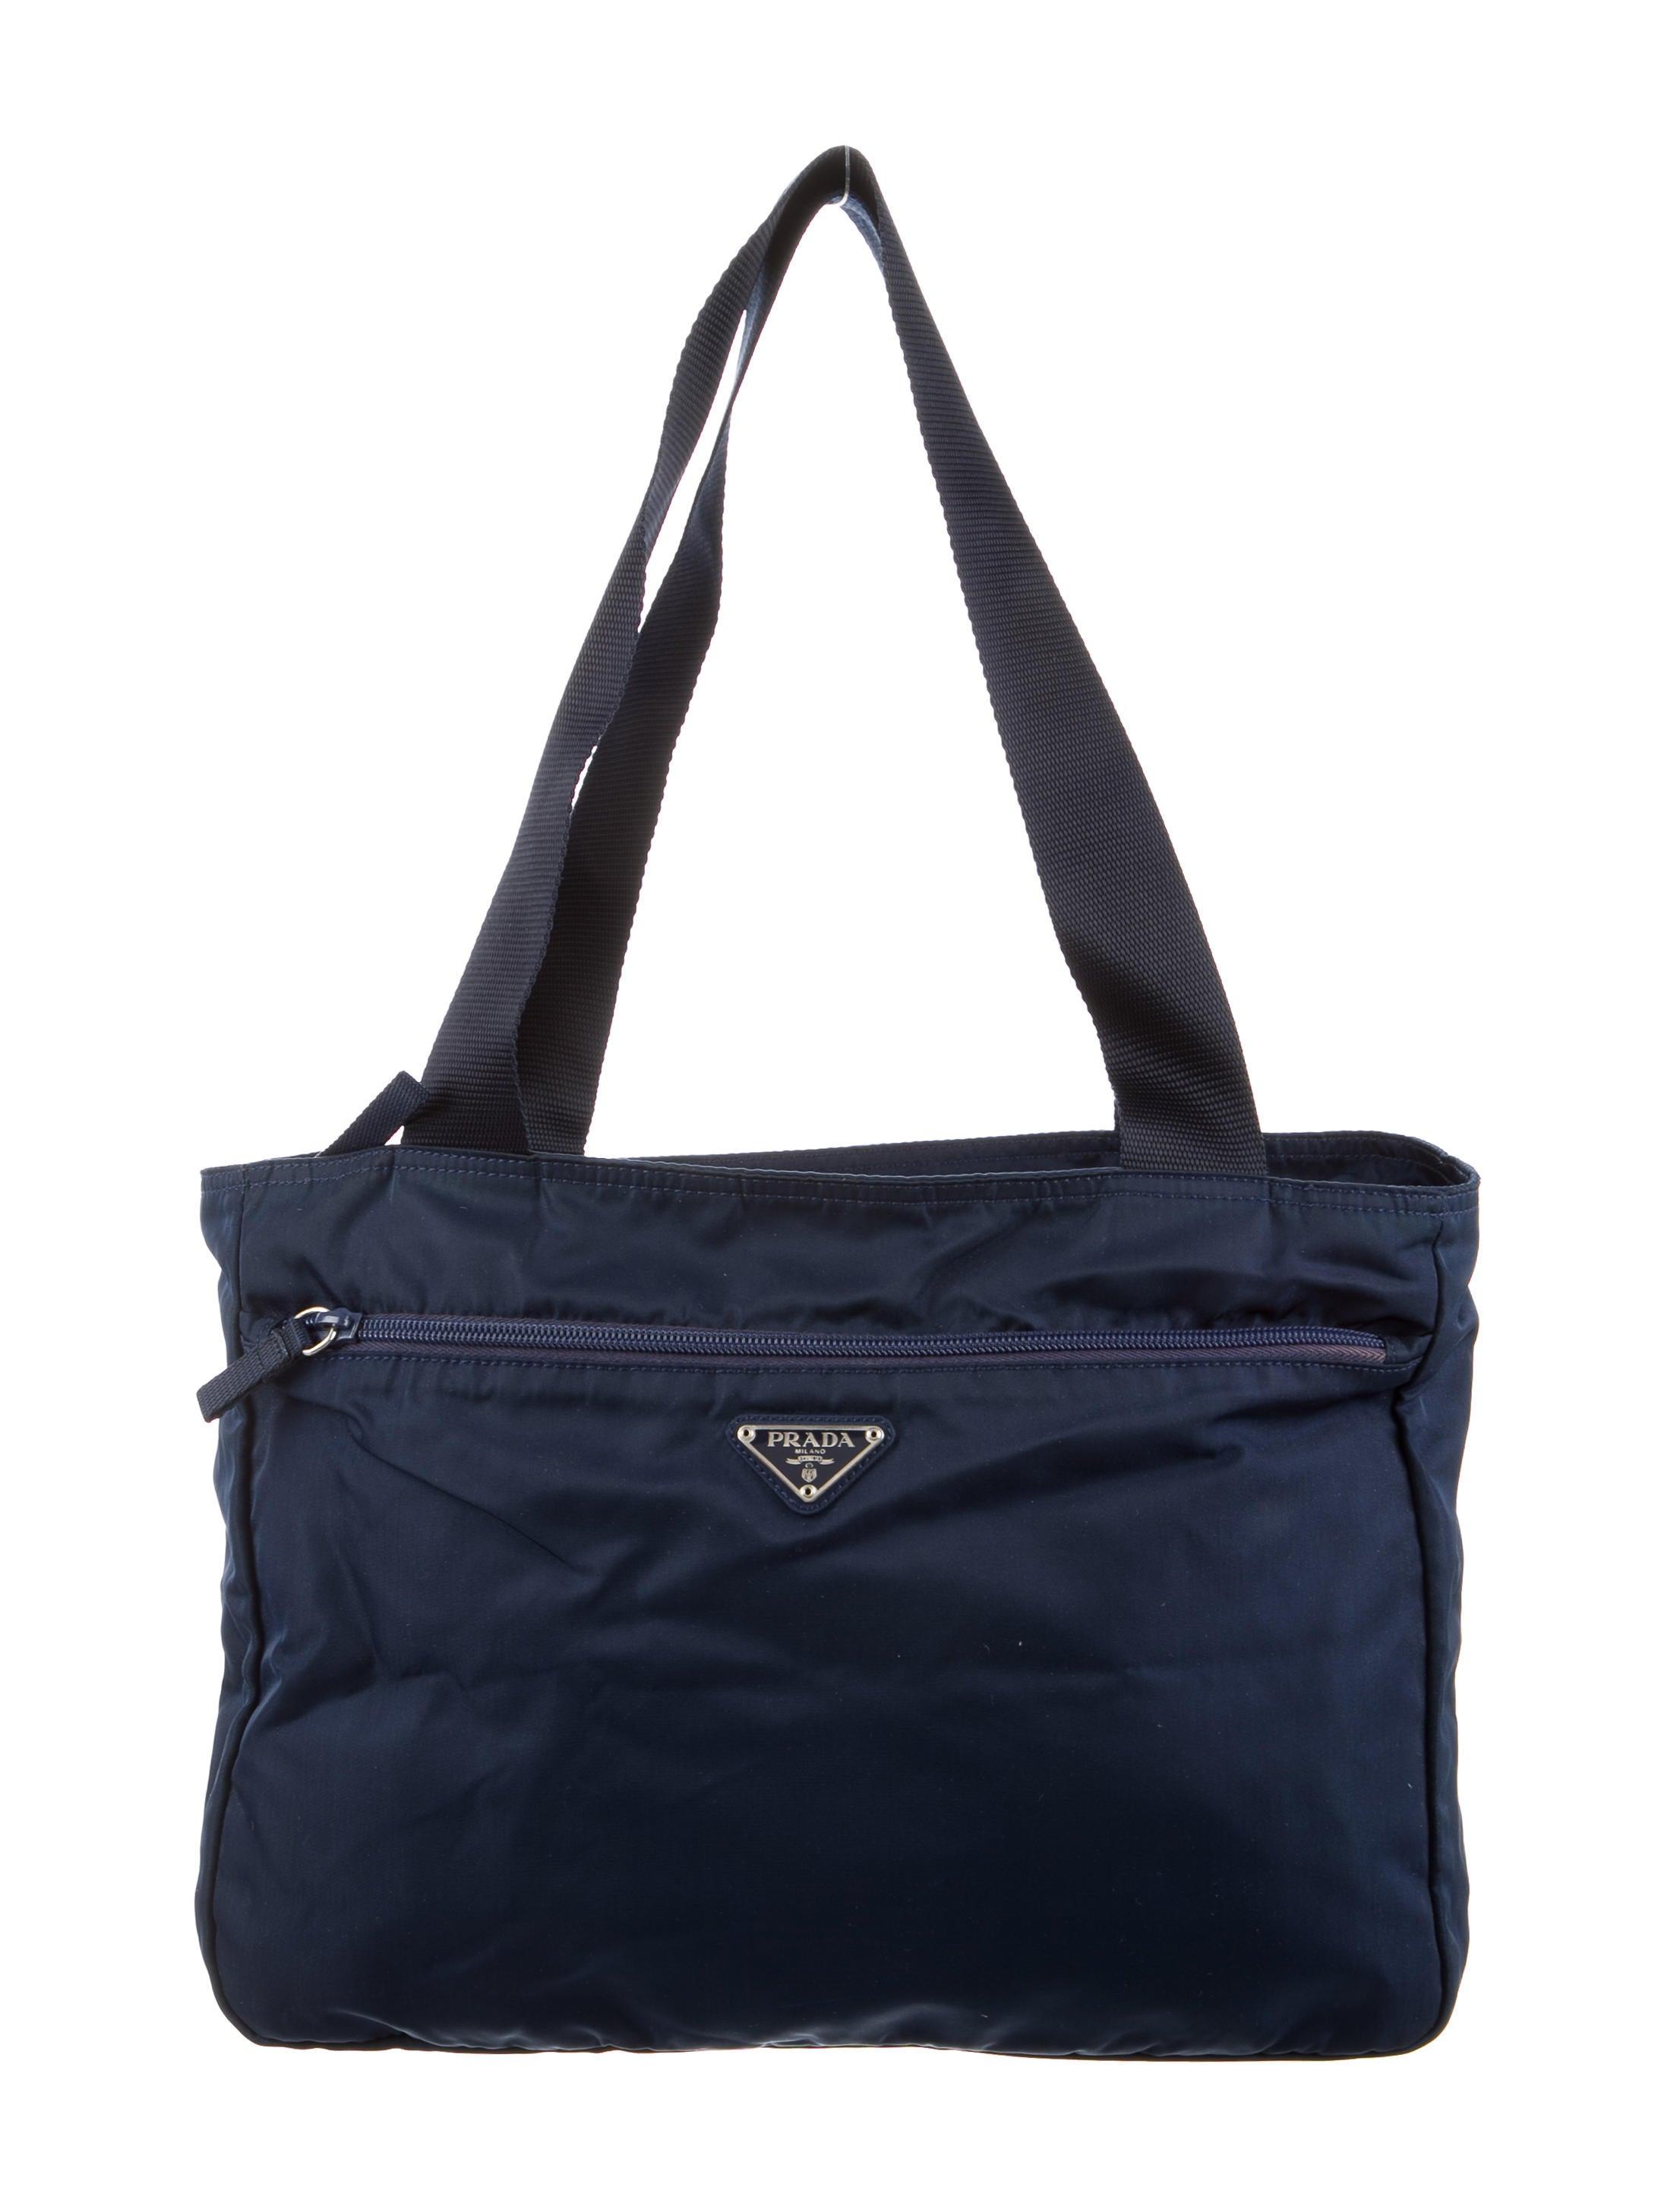 8ea374b9f095 Prada Vela Nylon Shoulder Bag - Handbags - PRA110835